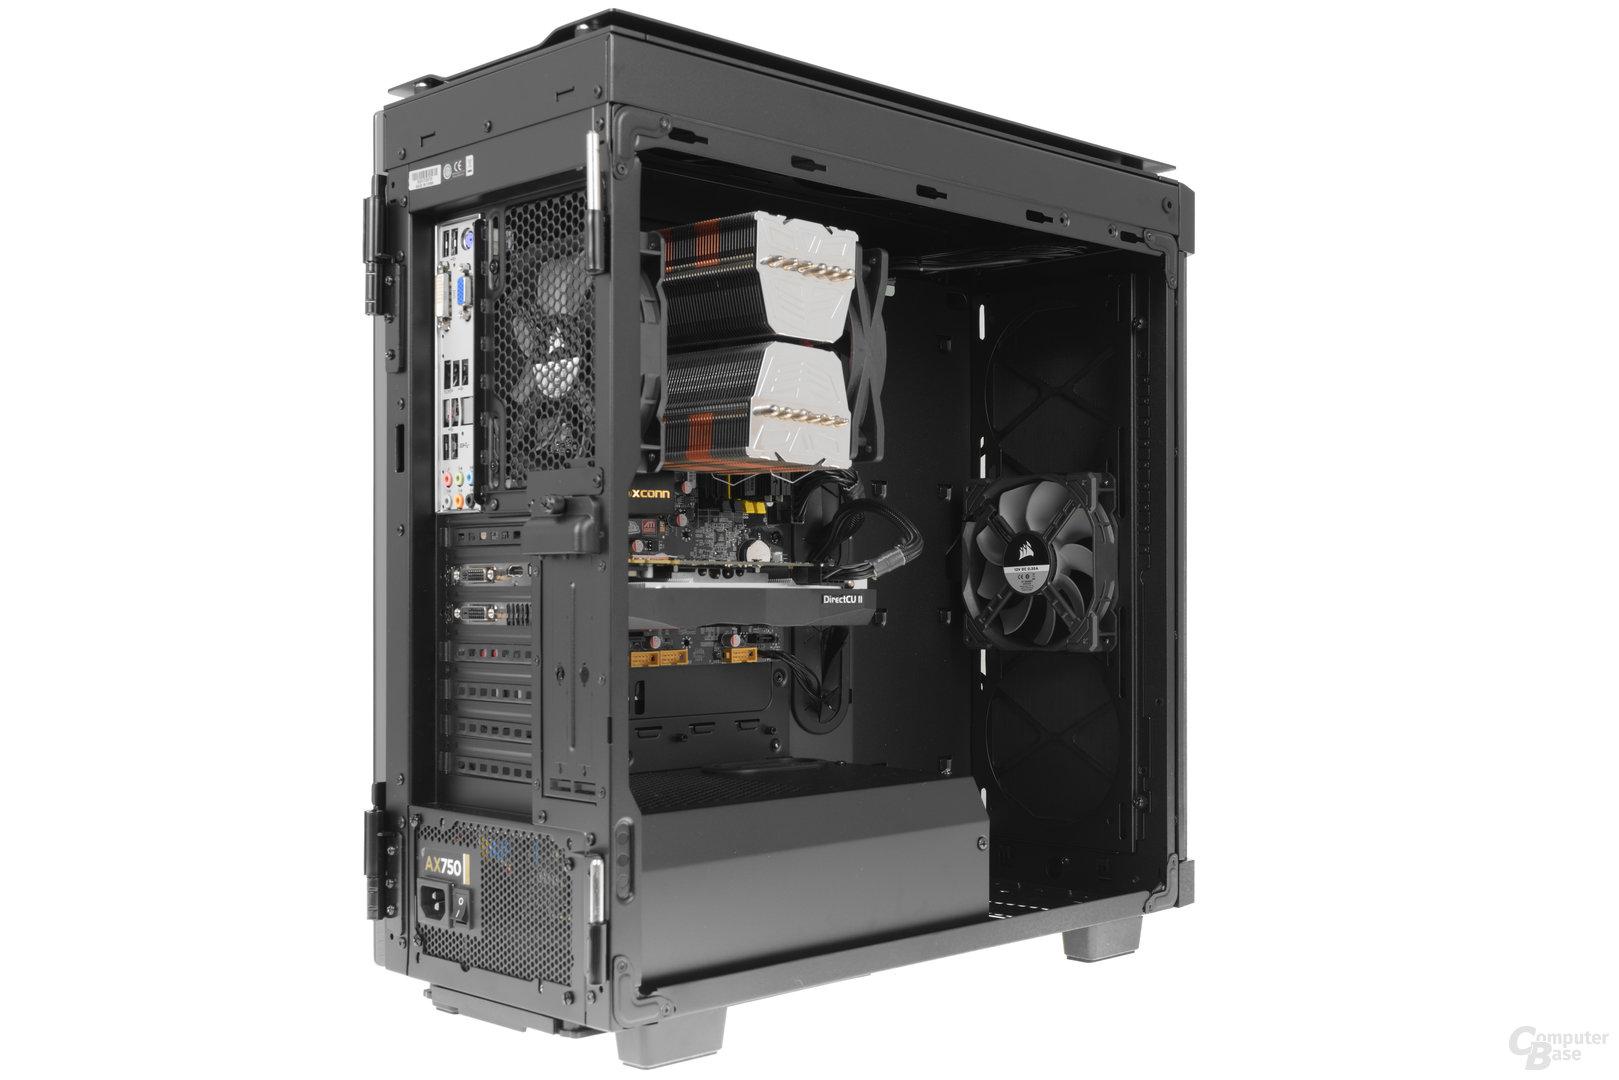 Corsair Obsidian 500D – Testsystem